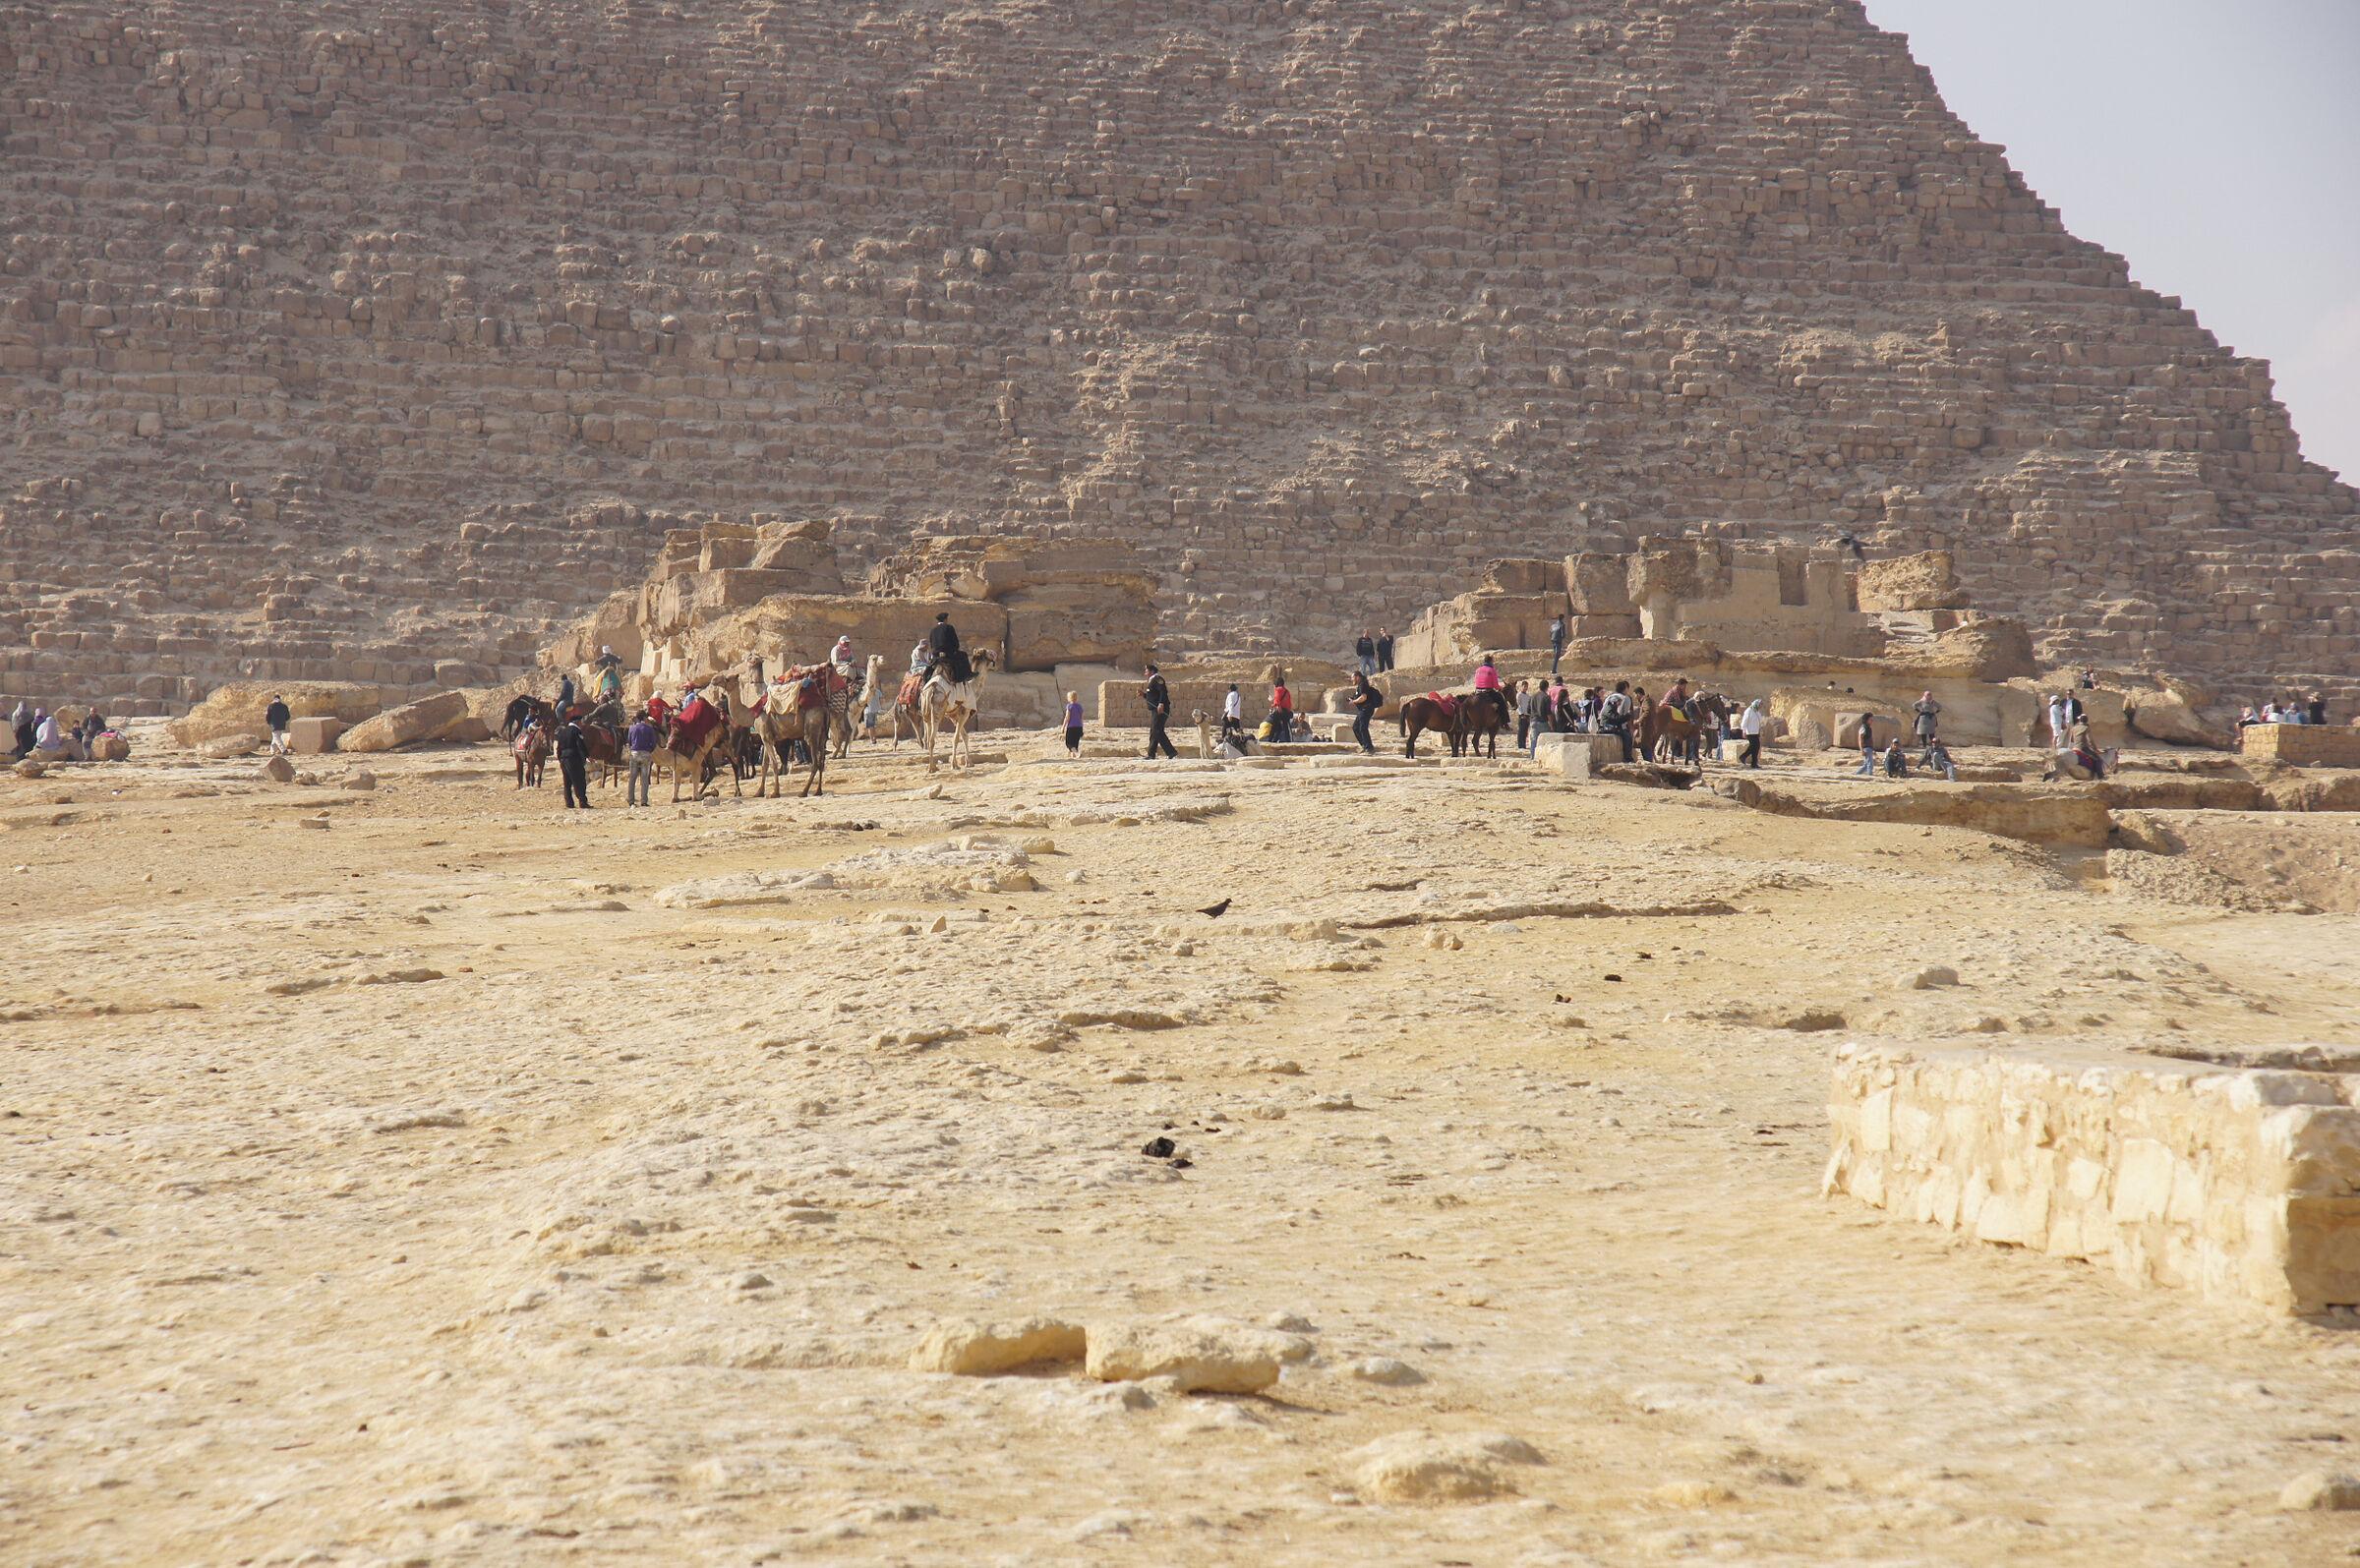 Khafre Pyramid Complex: Site: Giza; View: Khafre Causeway, Khafre Pyramid, Khafre Pyramid Temple